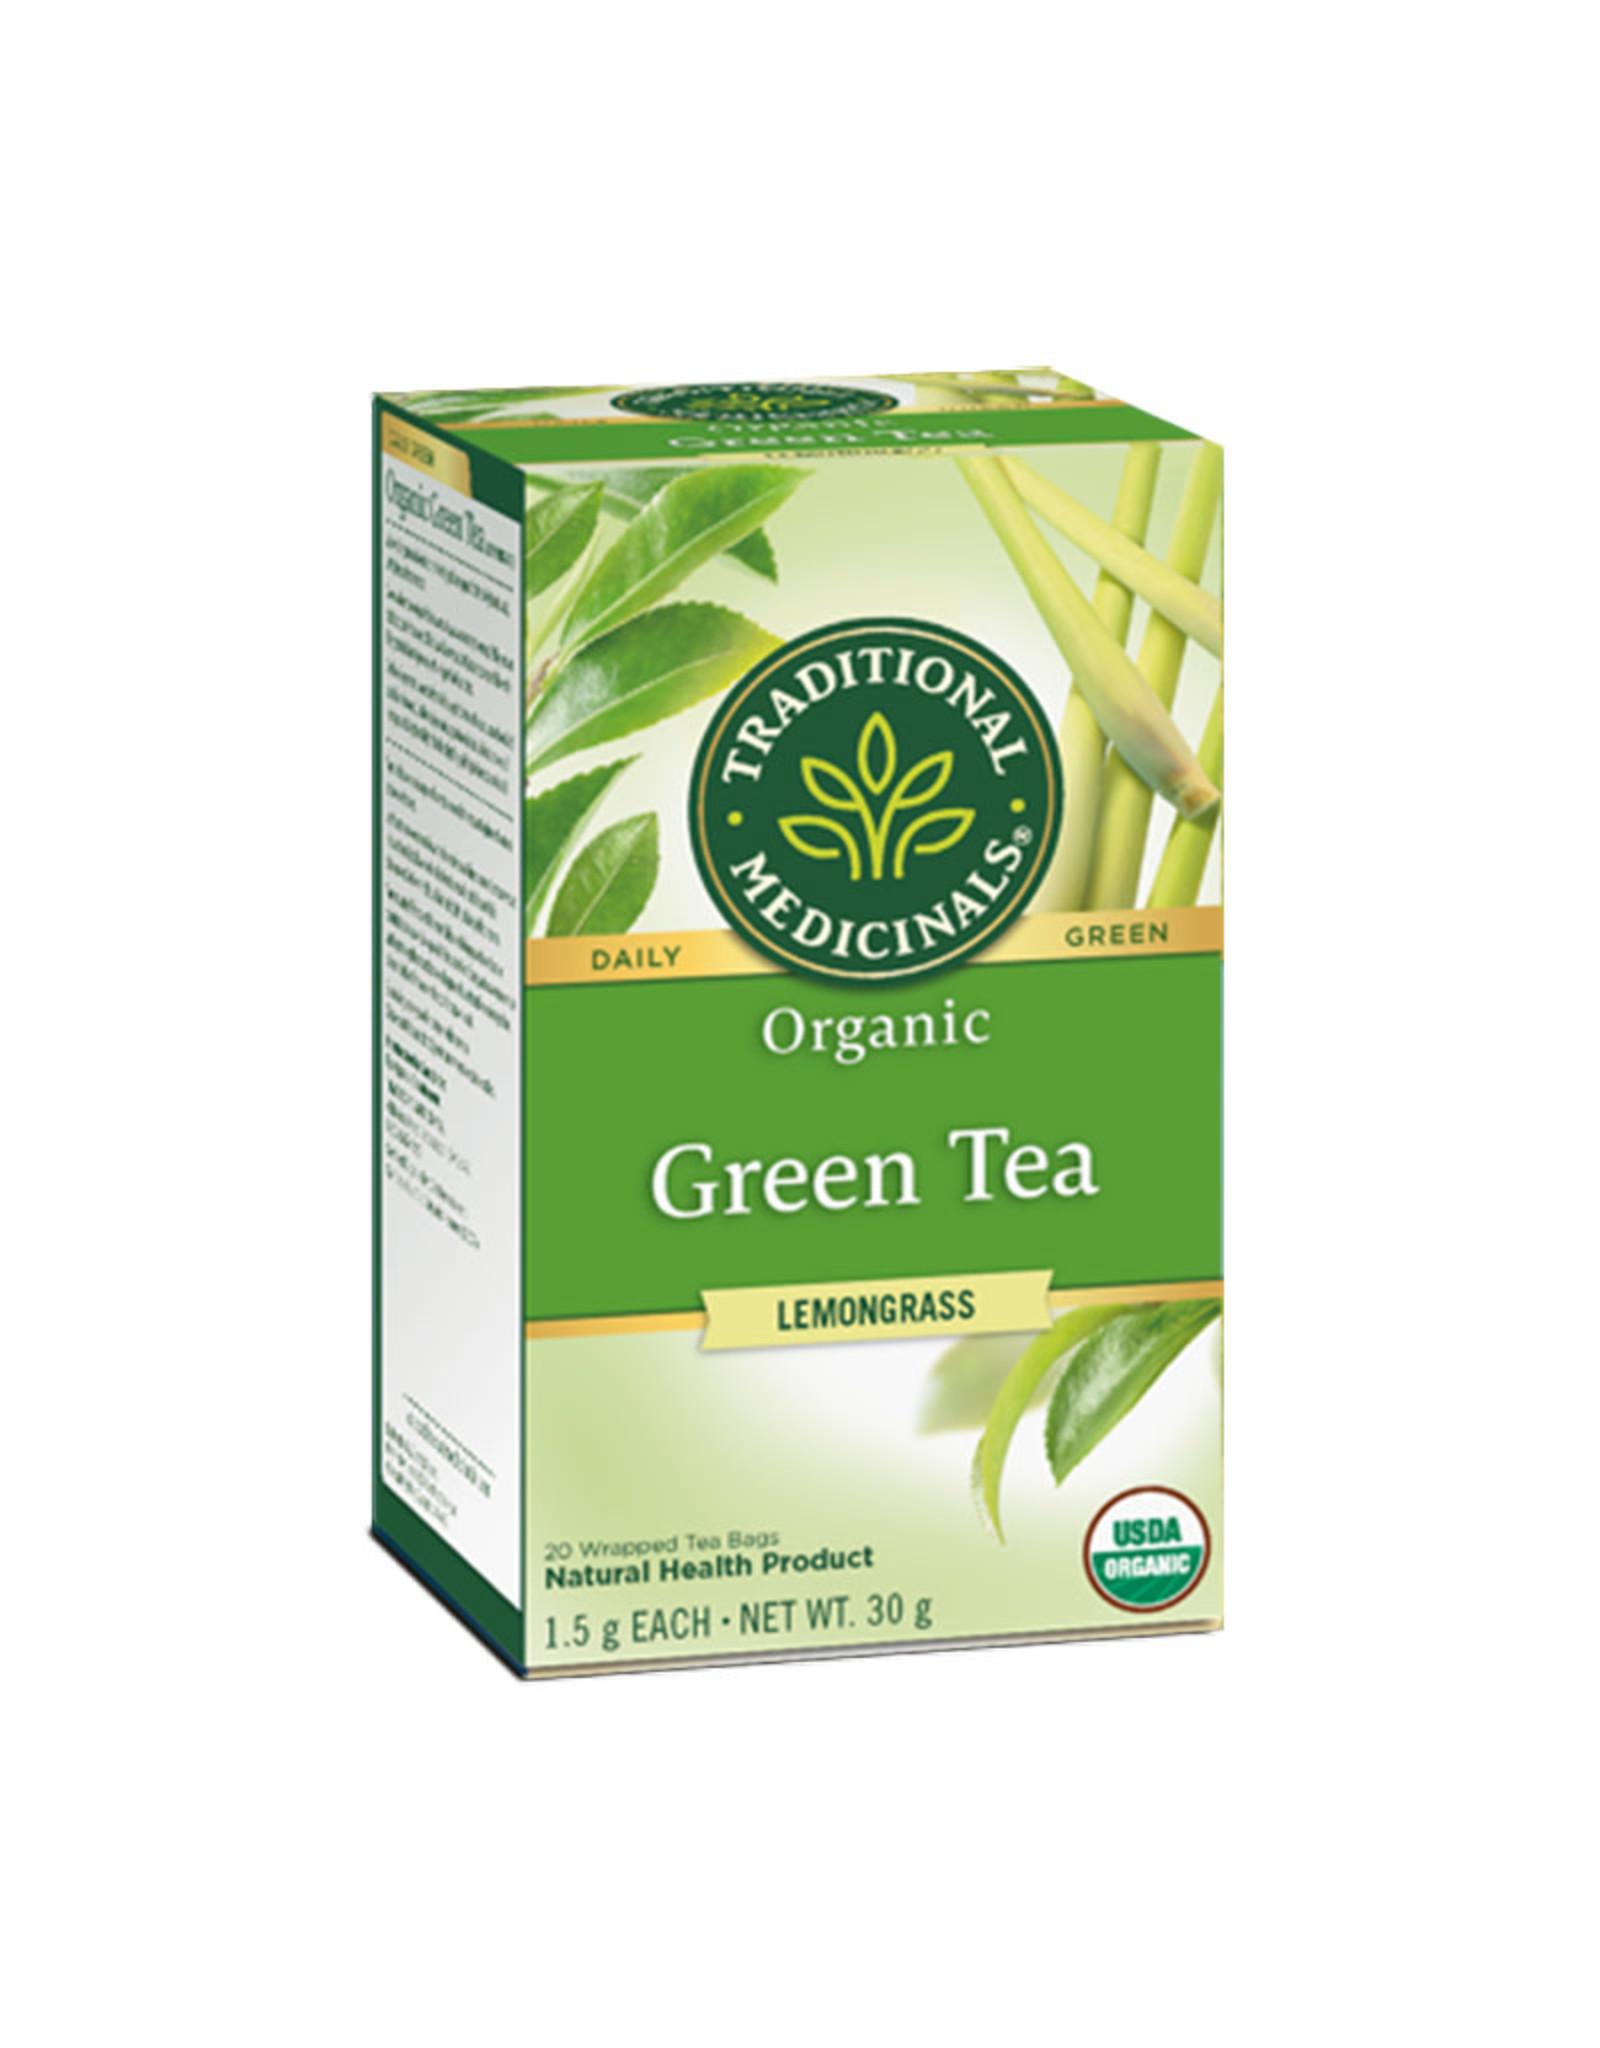 Traditional Medicinals Traditional Medicinals - Fair Trade Herbal Tea, Organic Green Tea with Lemongrass